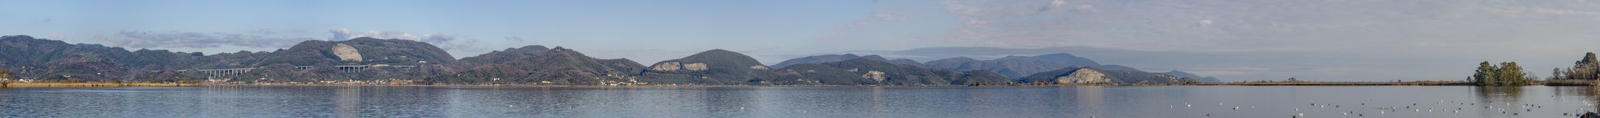 Vue panoramique de lac Massaciuccoli de Torre del Lago Puccini, Lucques, Toscane, Italie images stock